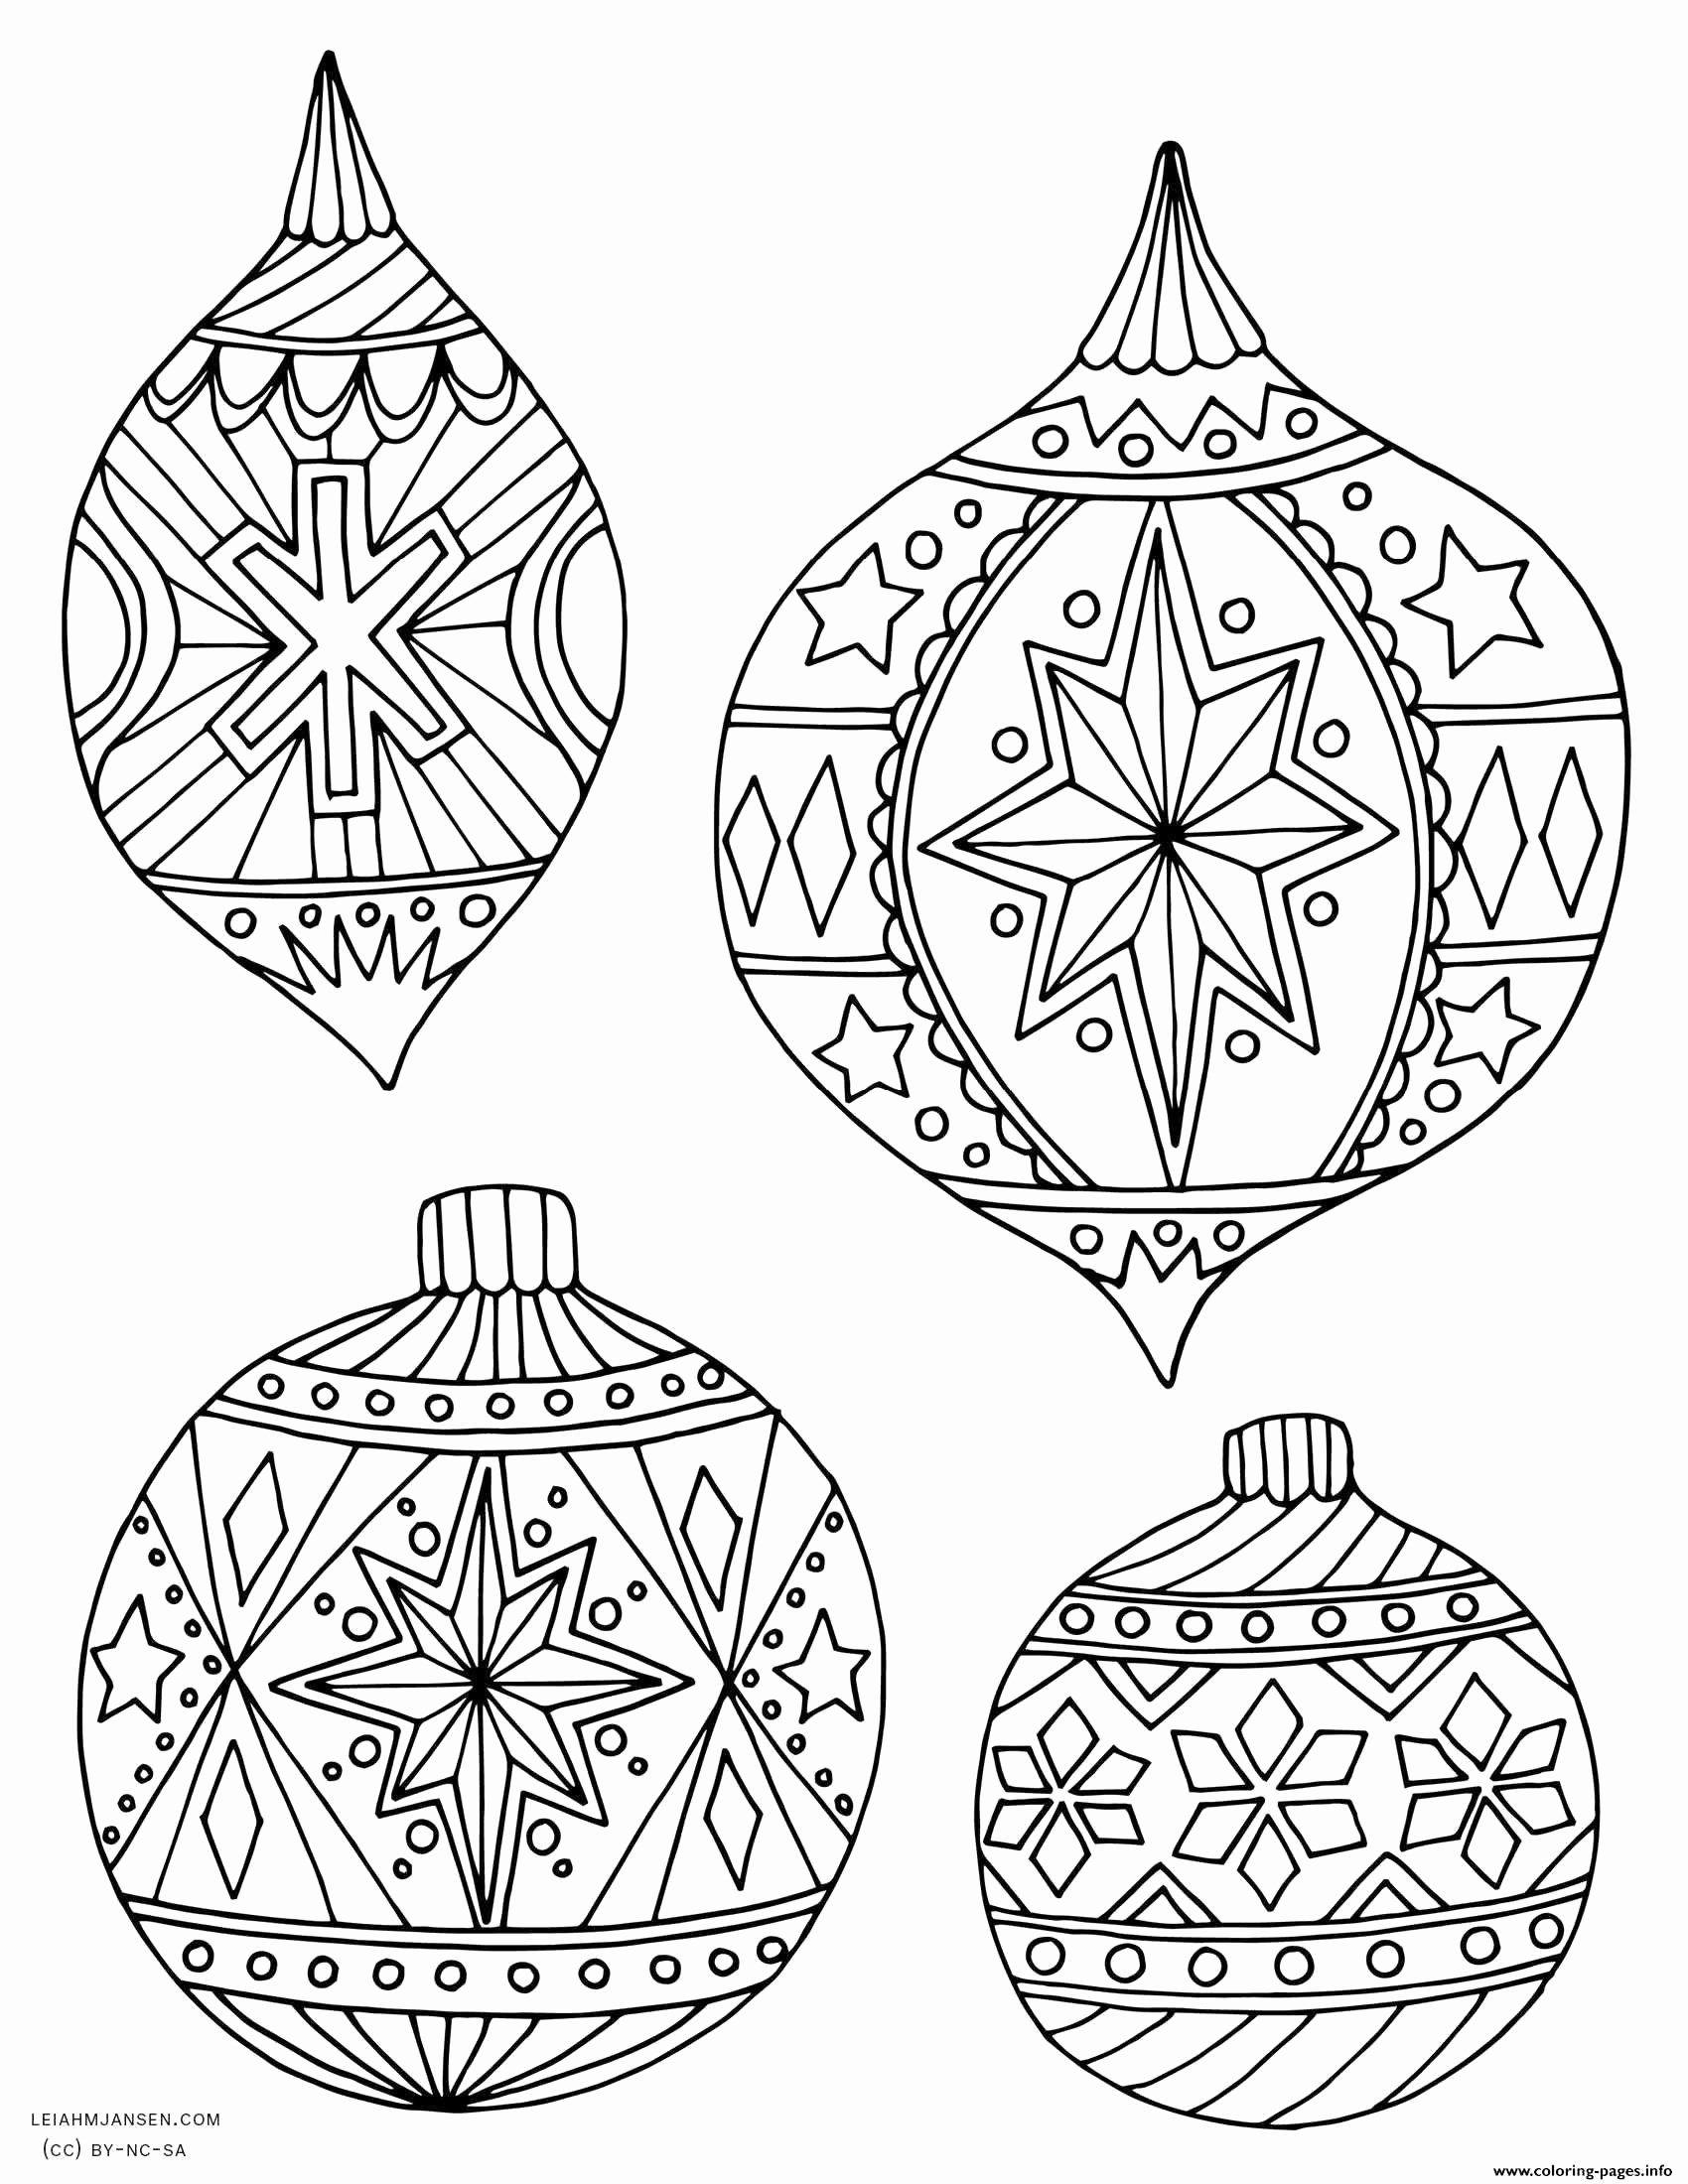 94dc29399207a4508d6f92abdc5f81d8 » Disney Christmas Ornaments Coloring Pages